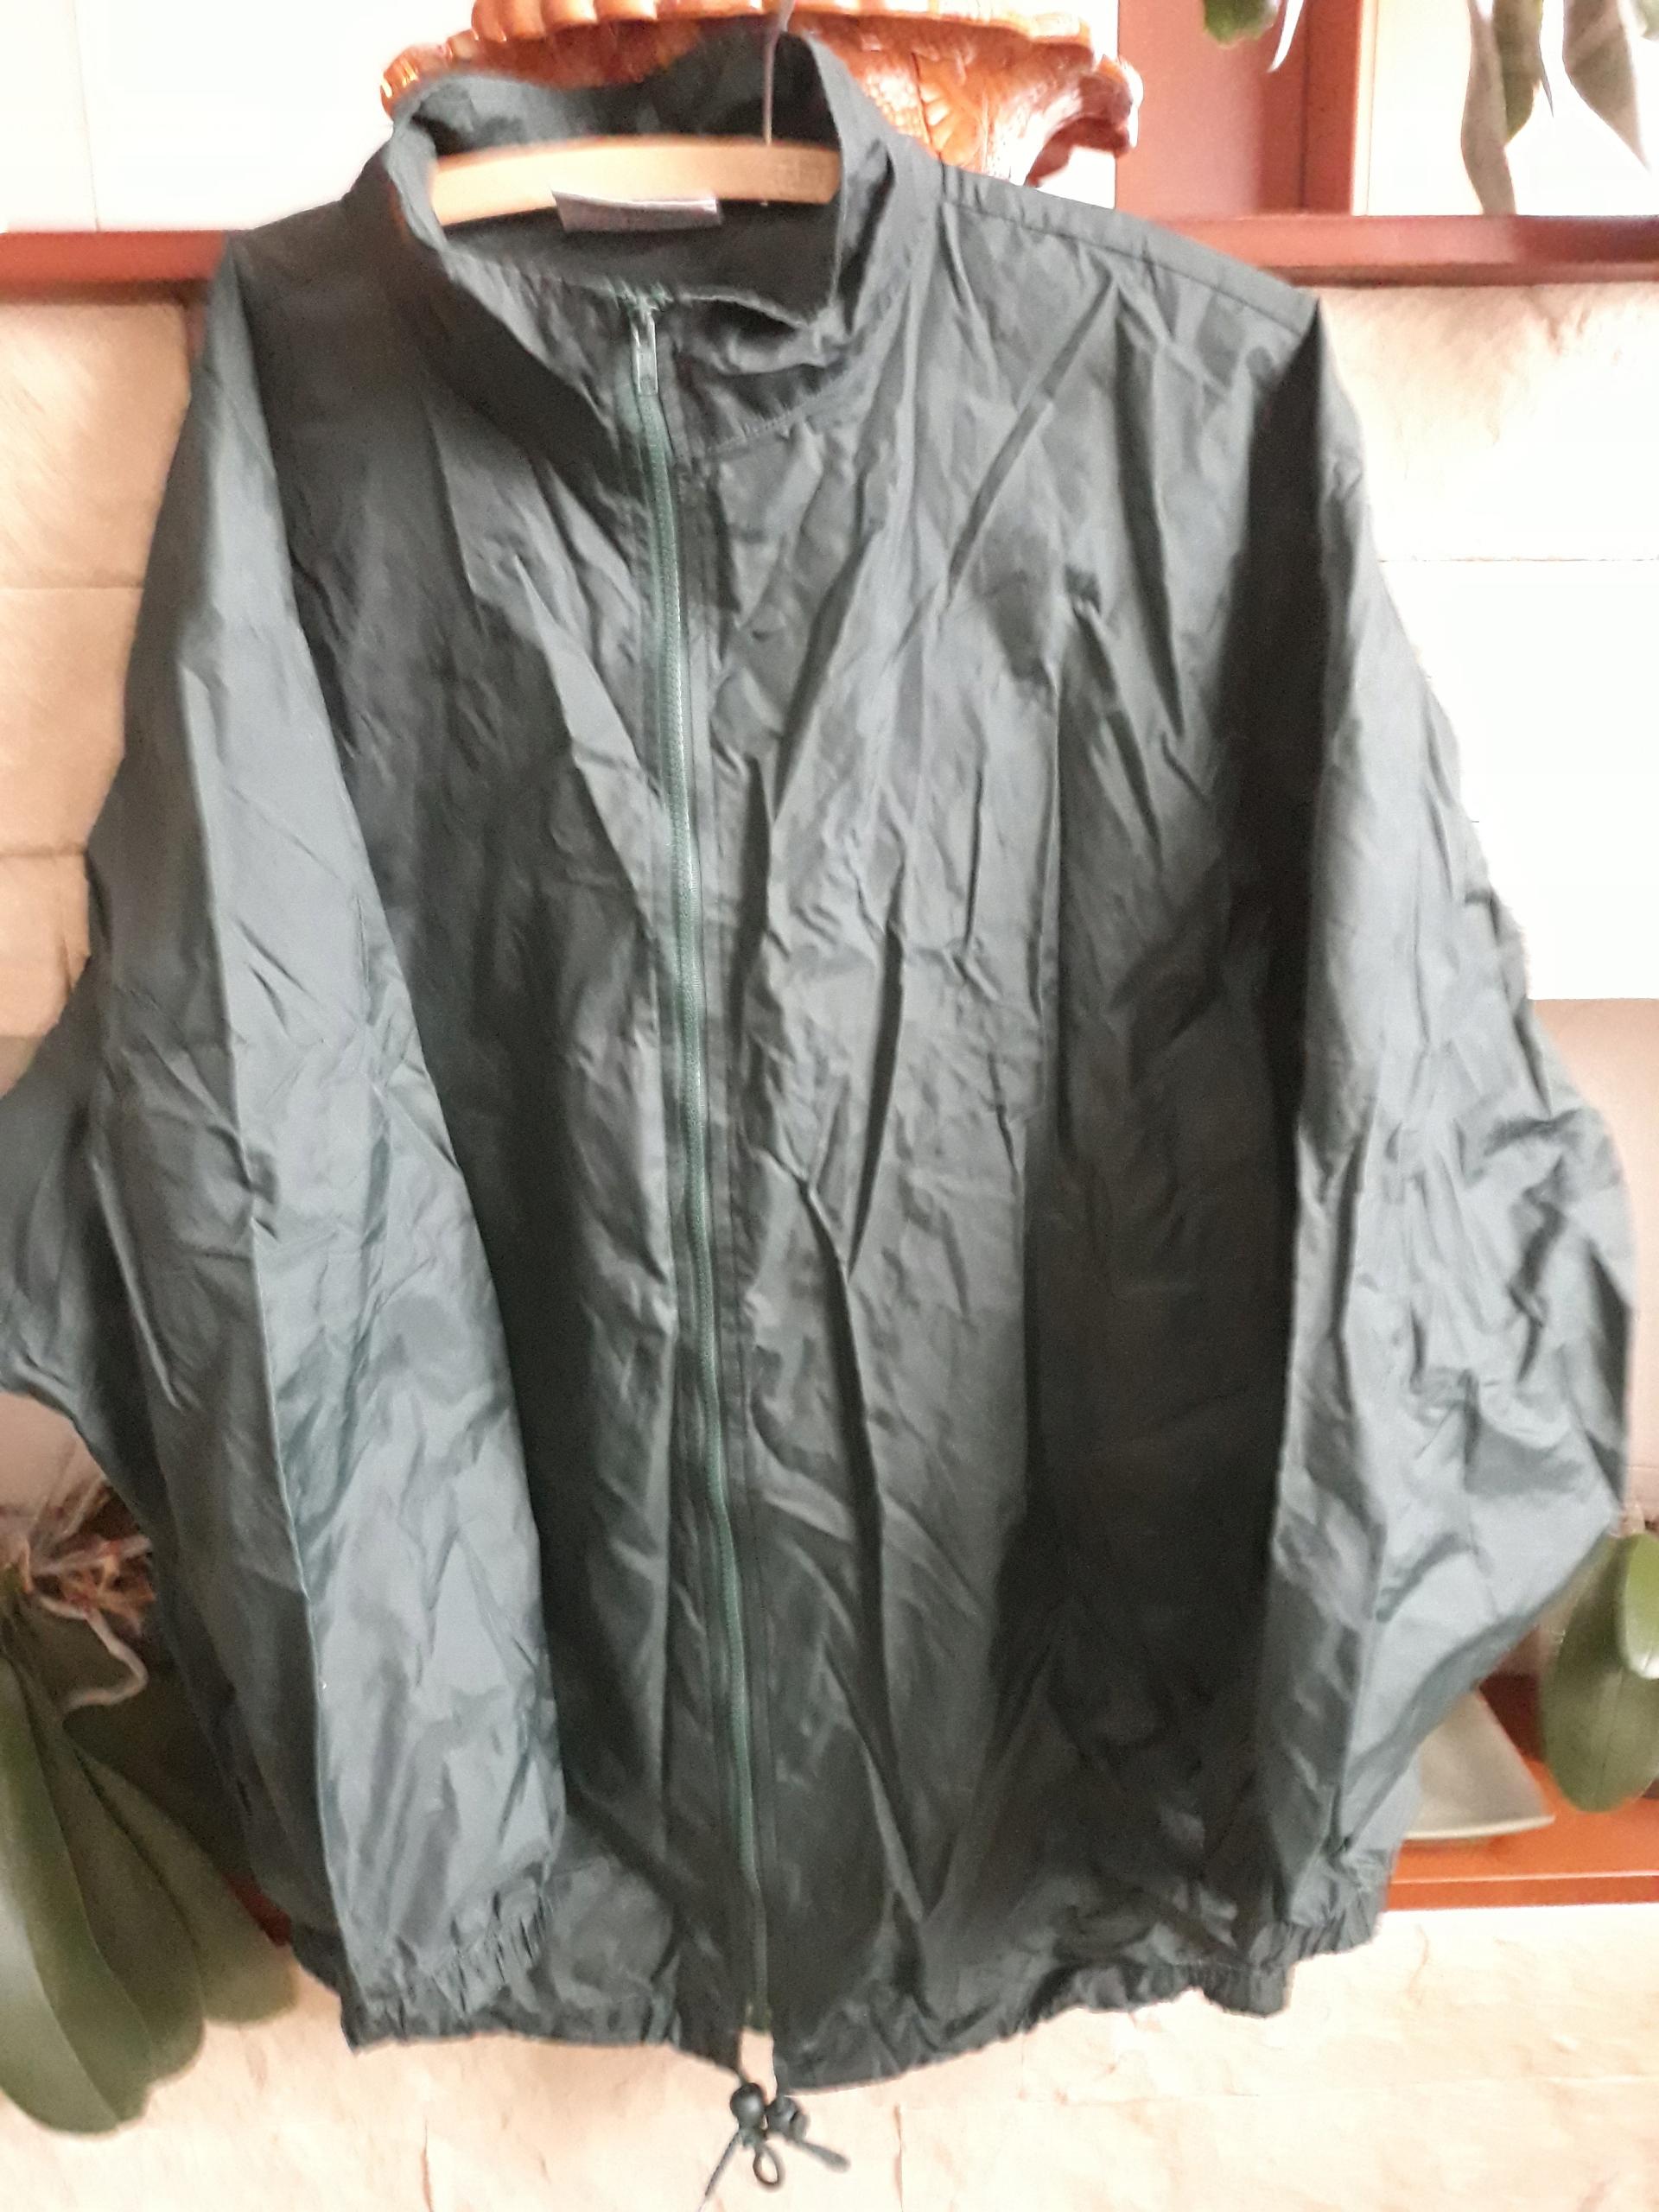 OKOCIM kurtka deszczówka HANES